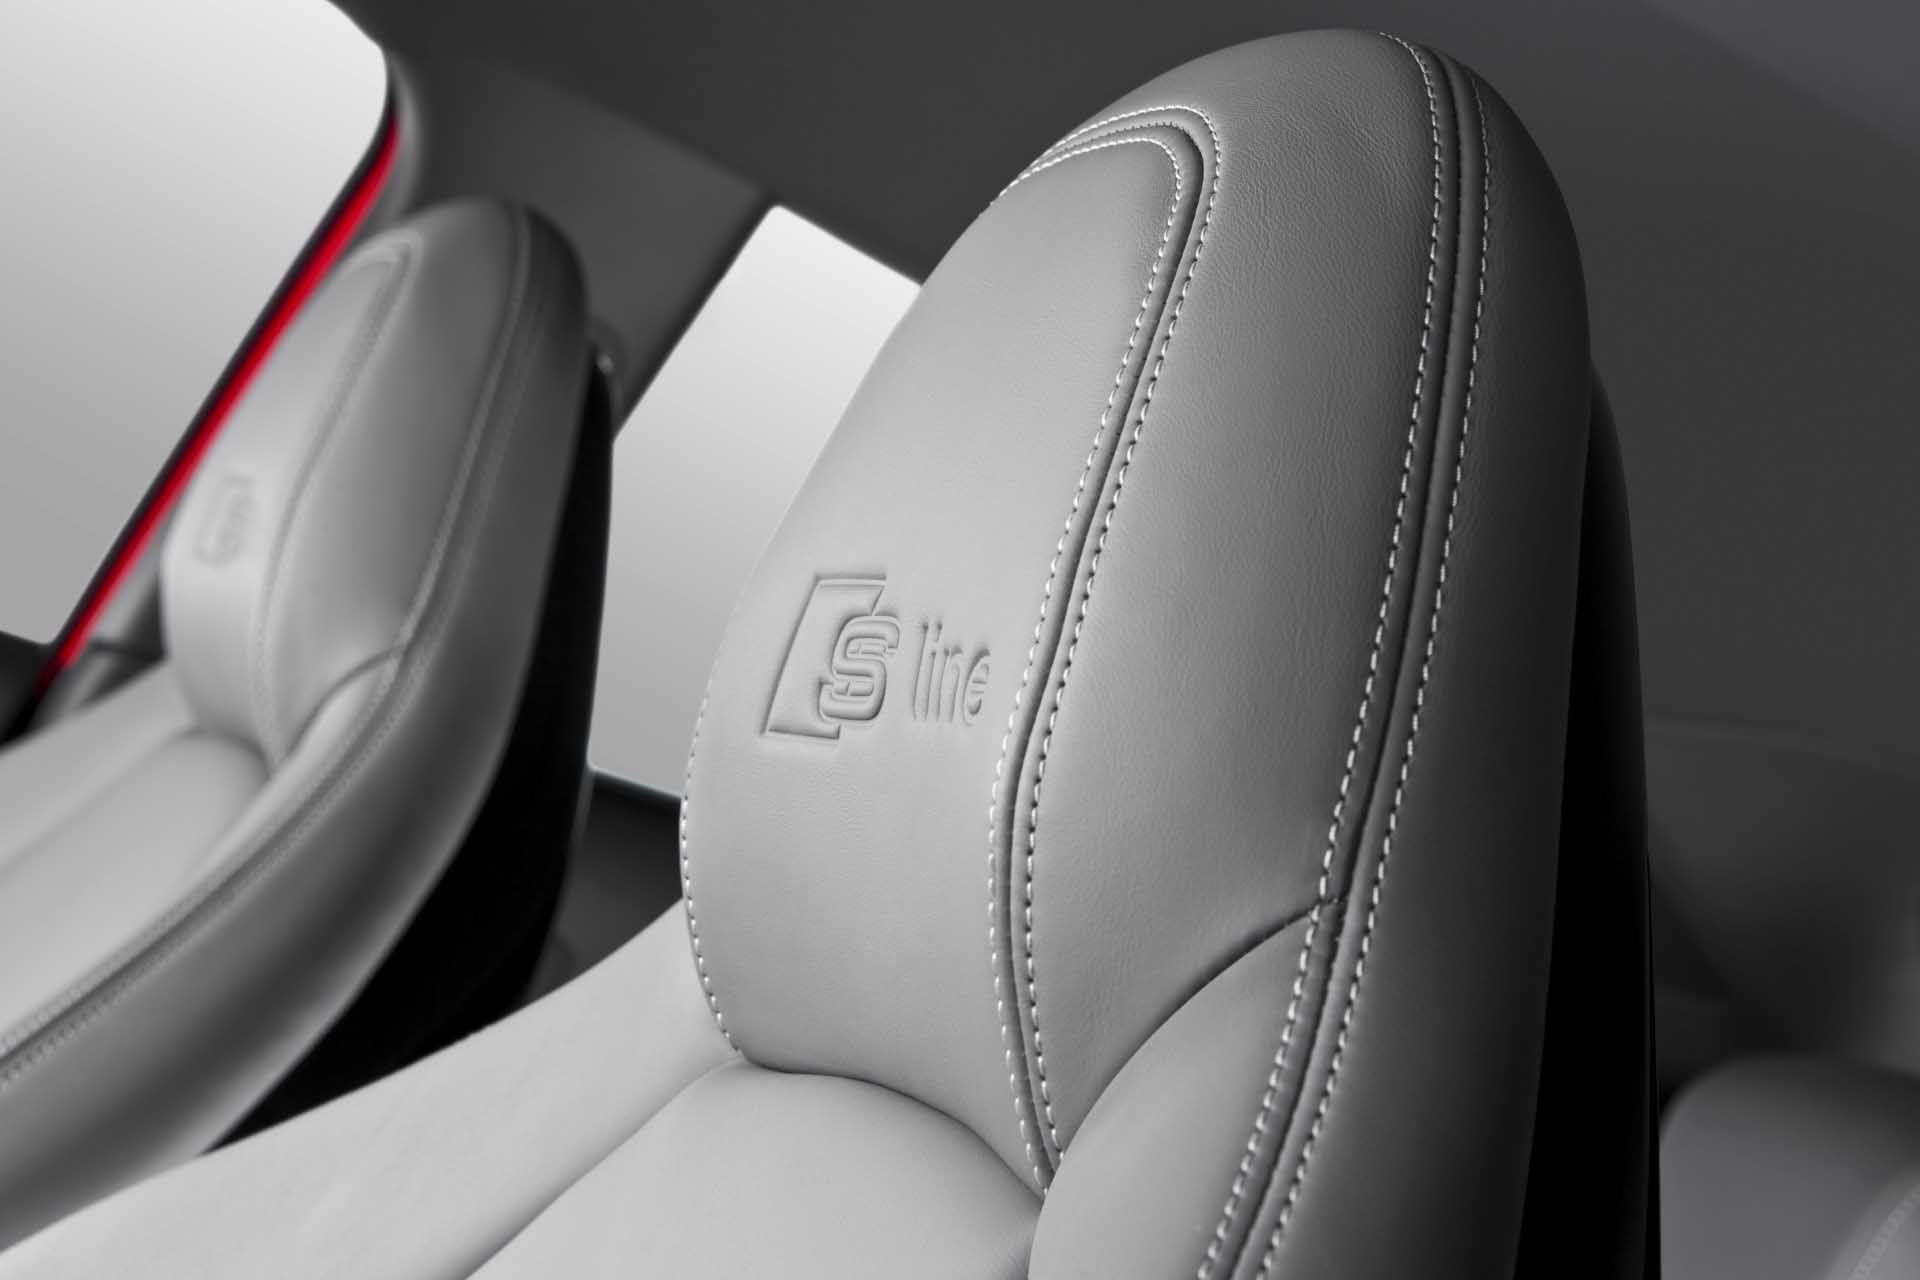 10 Incredible Audi A1 Headrest Iphone Wallpapers Audi Audi Audi